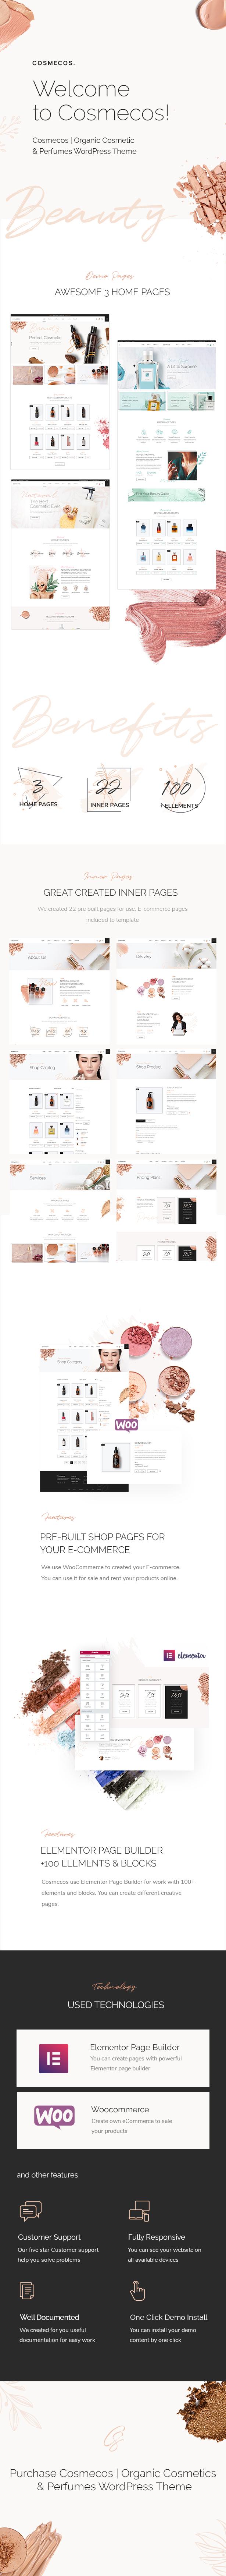 Cosmecos v1.1 | 美容化妆品和香水 WordPress 模板主题-好哇网